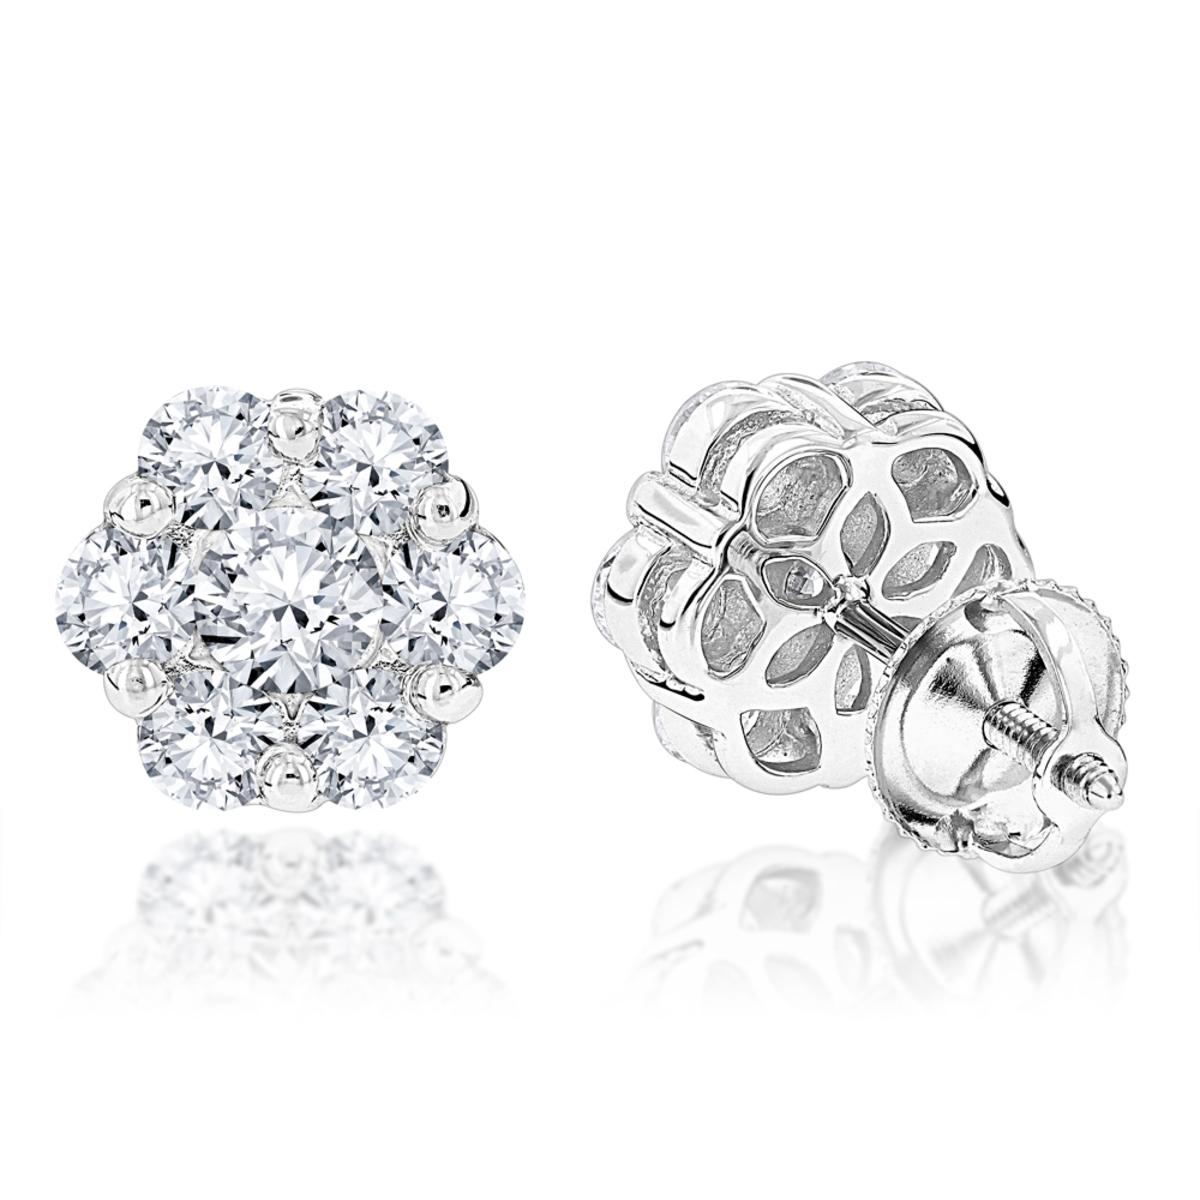 Large Diamond Cluster Earrings 1.90ct 14K Gold Studs